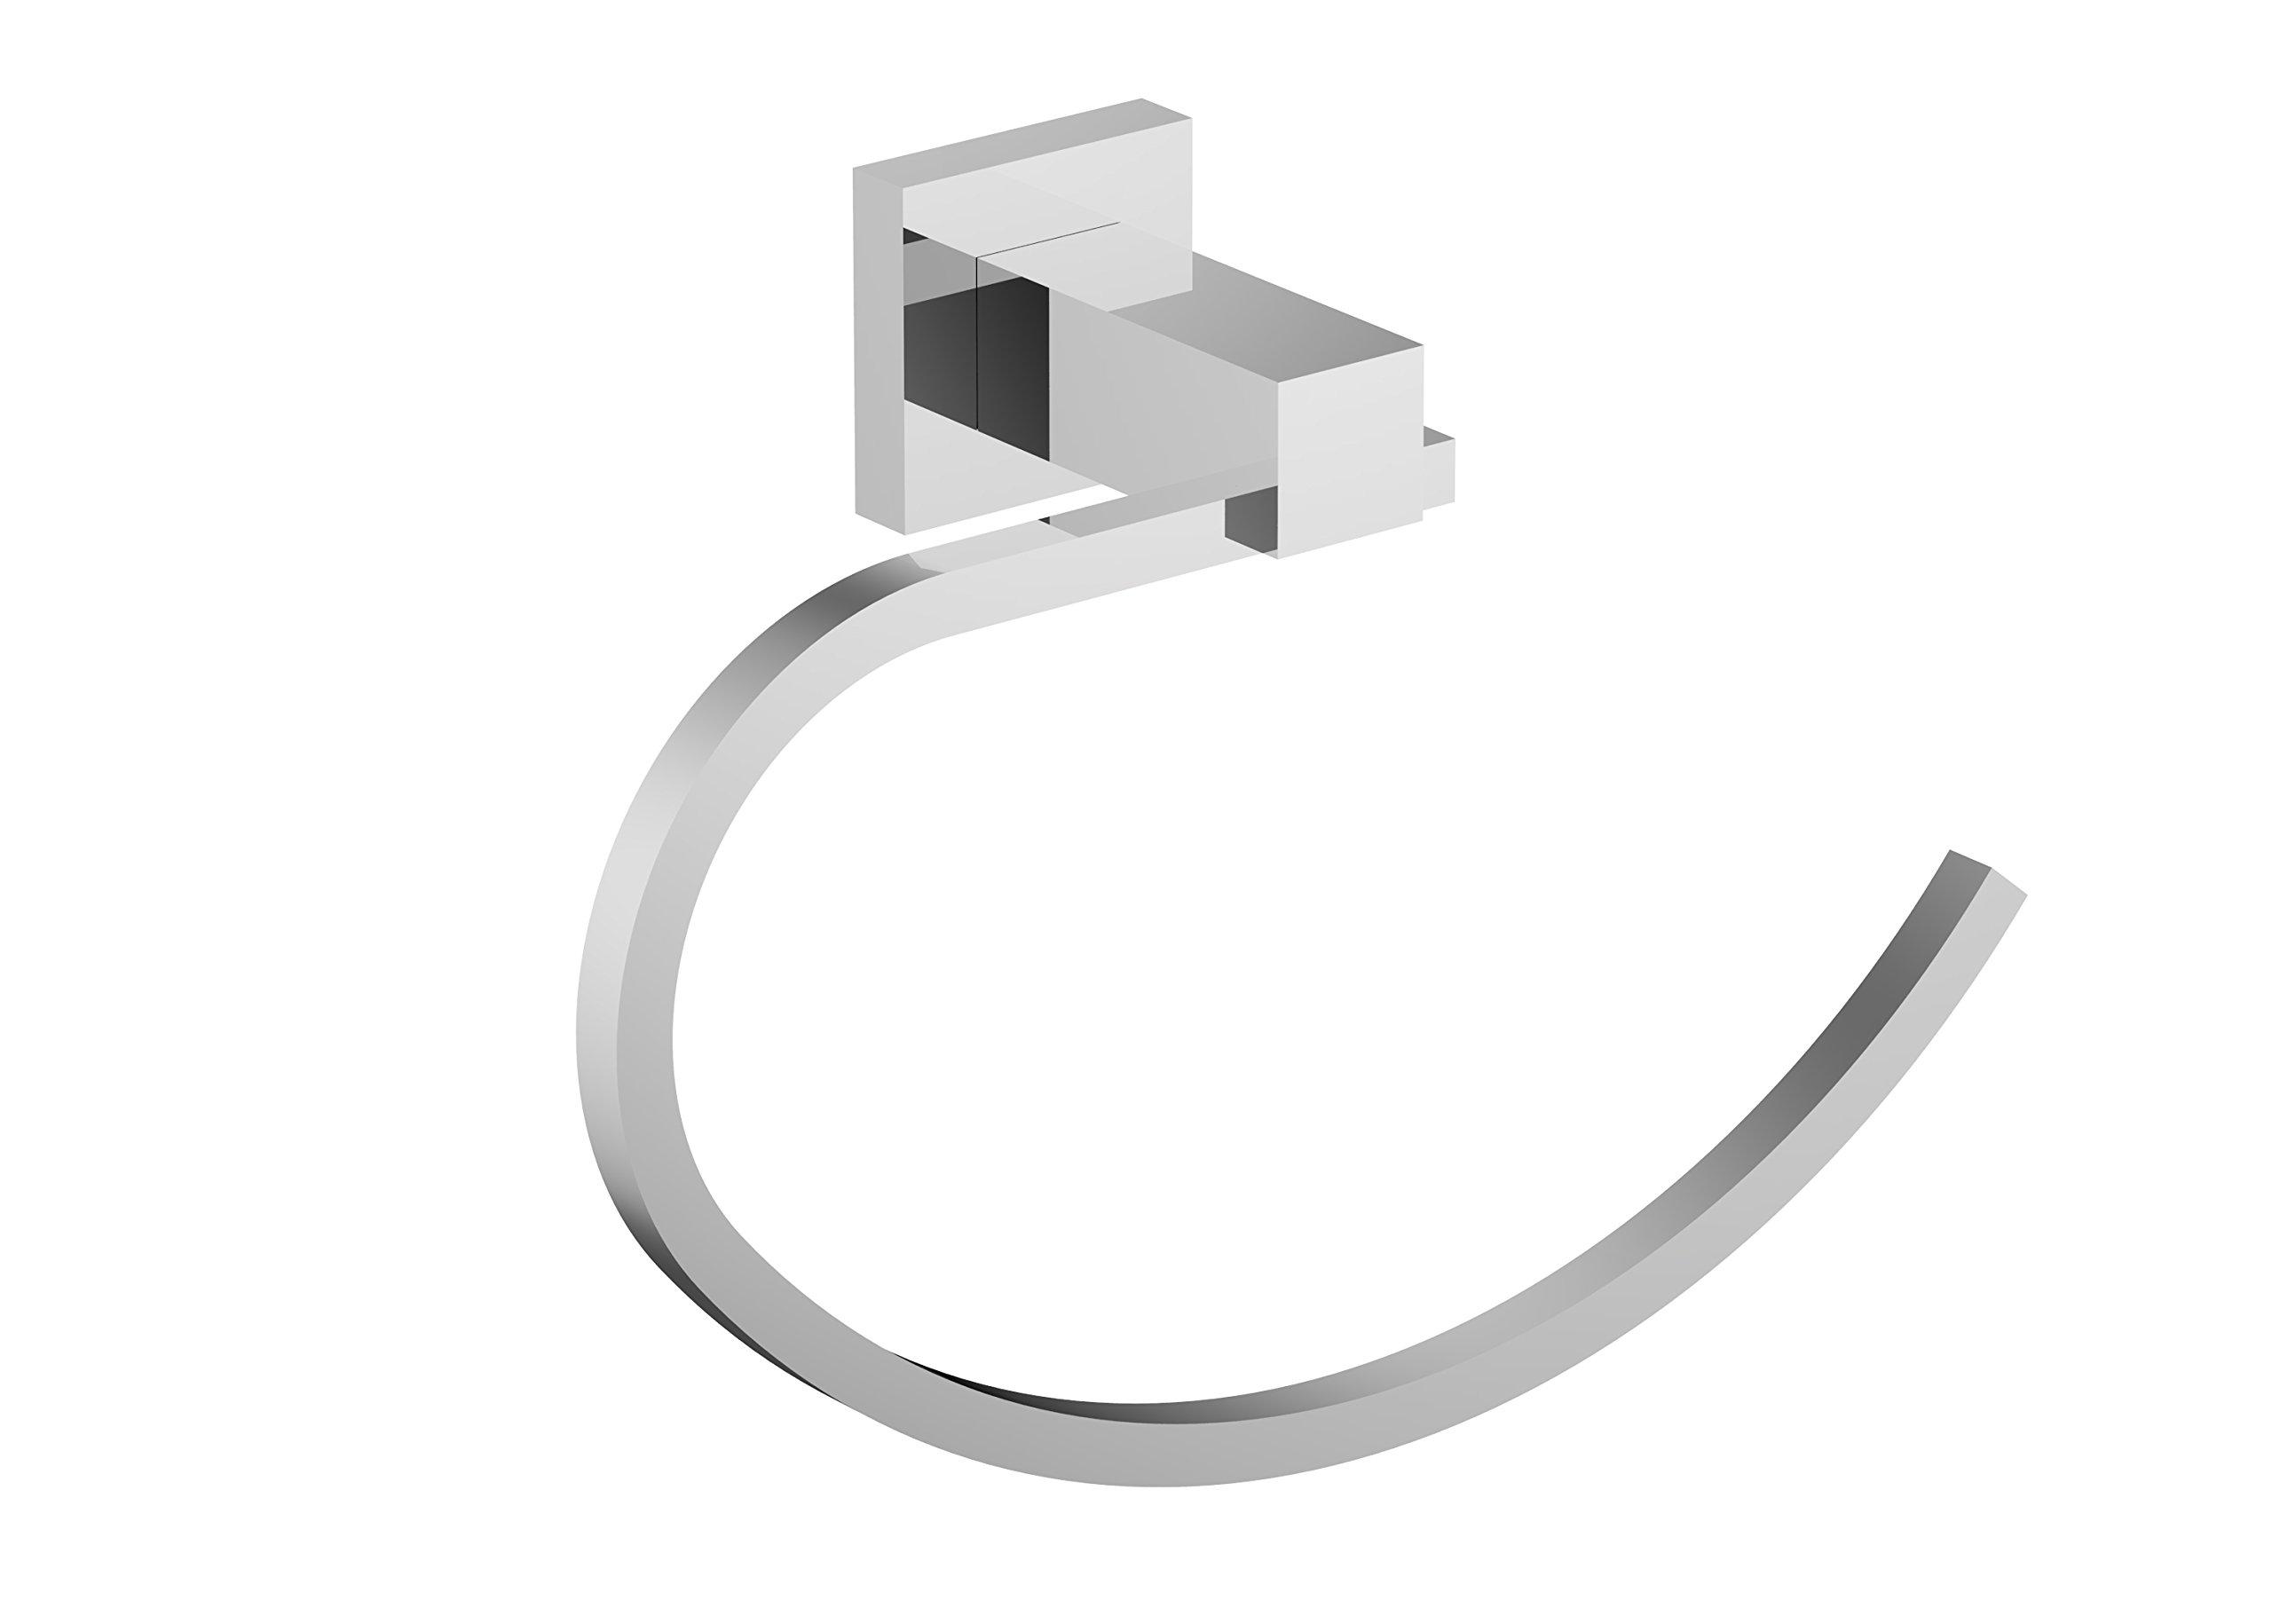 Eviva EVAC40CH Holde Towel Holder Bathroom Accessories Combination, Chrome